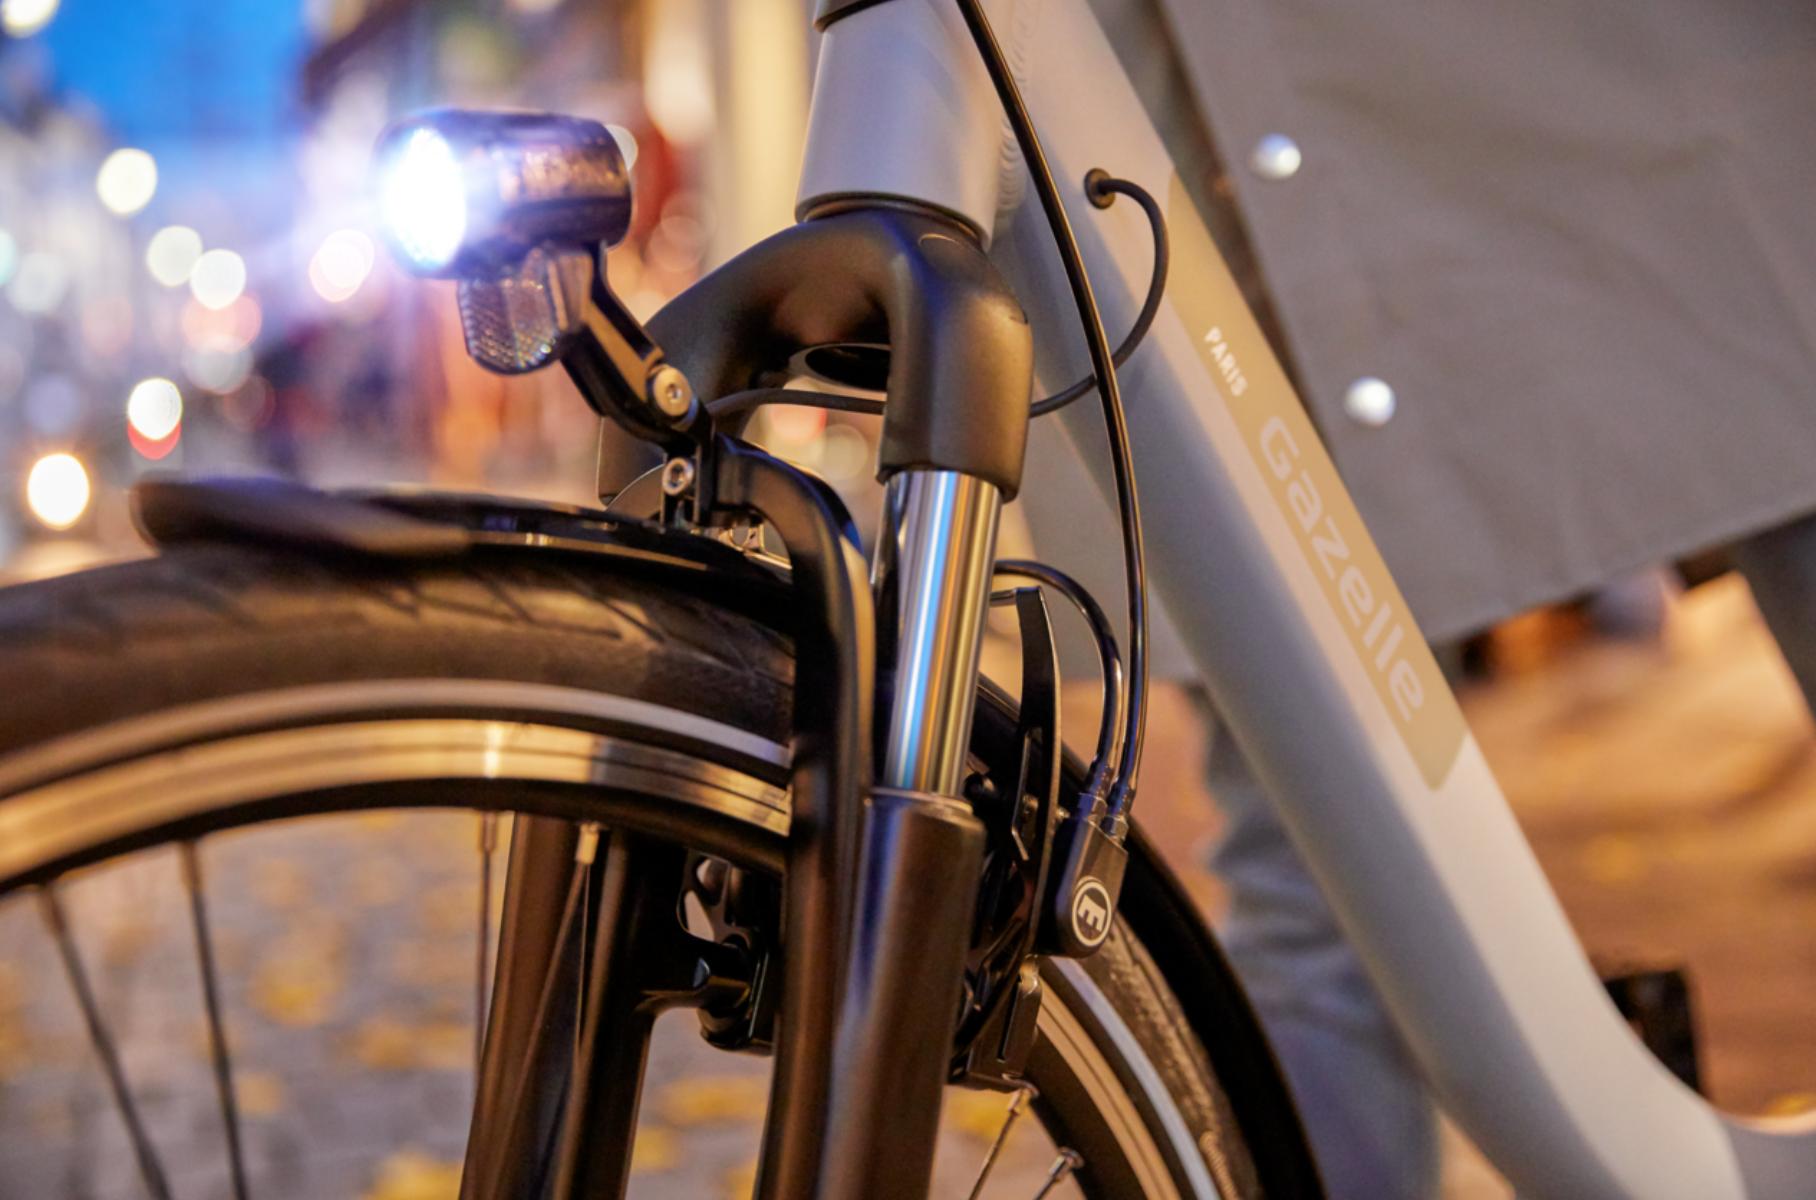 Forårsklar cykel